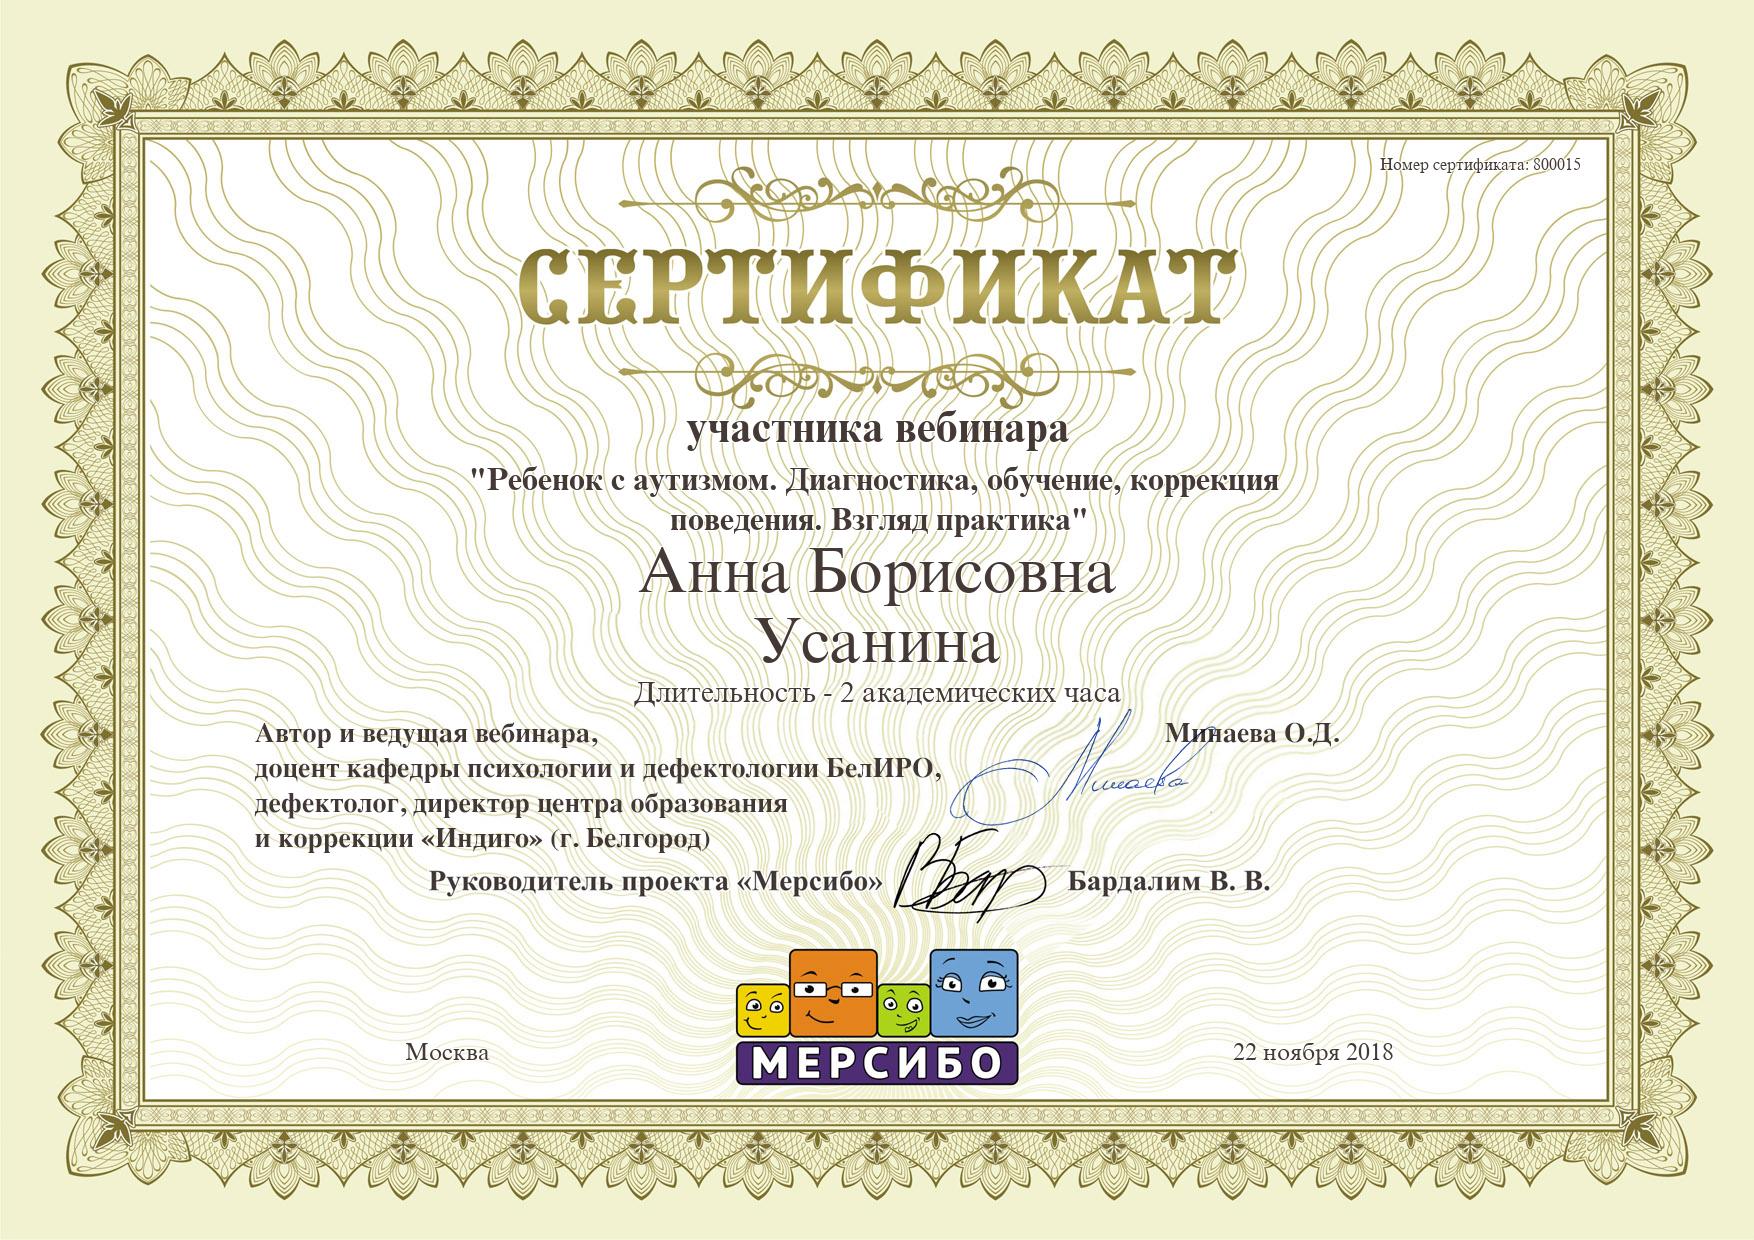 https://mersibo.ru/certificate/create?hash=6MQLBM2LDTQWSZKSKB327HSB2LC8NYZ